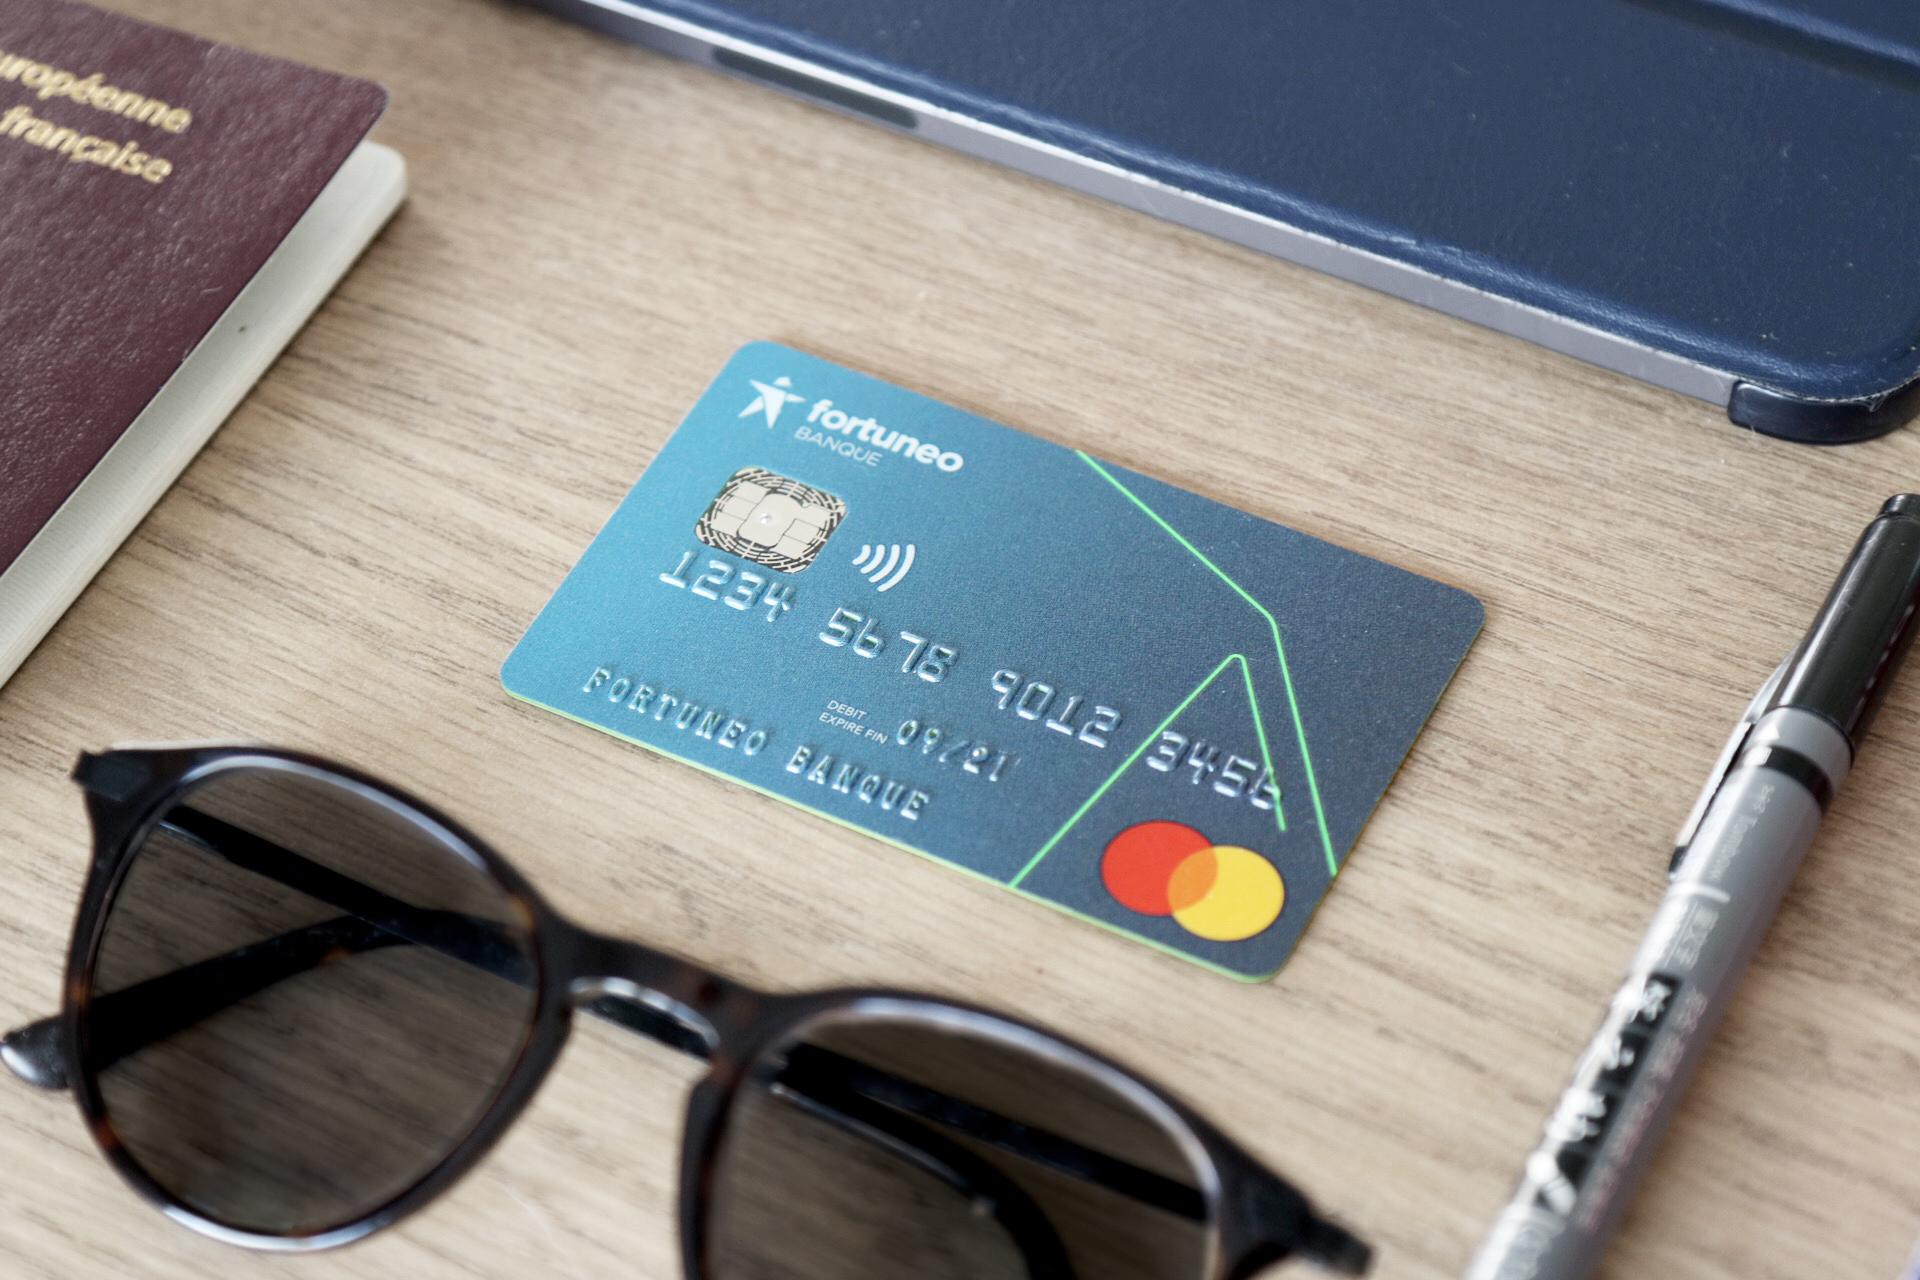 Carte bancaire FOSFO fortuneo